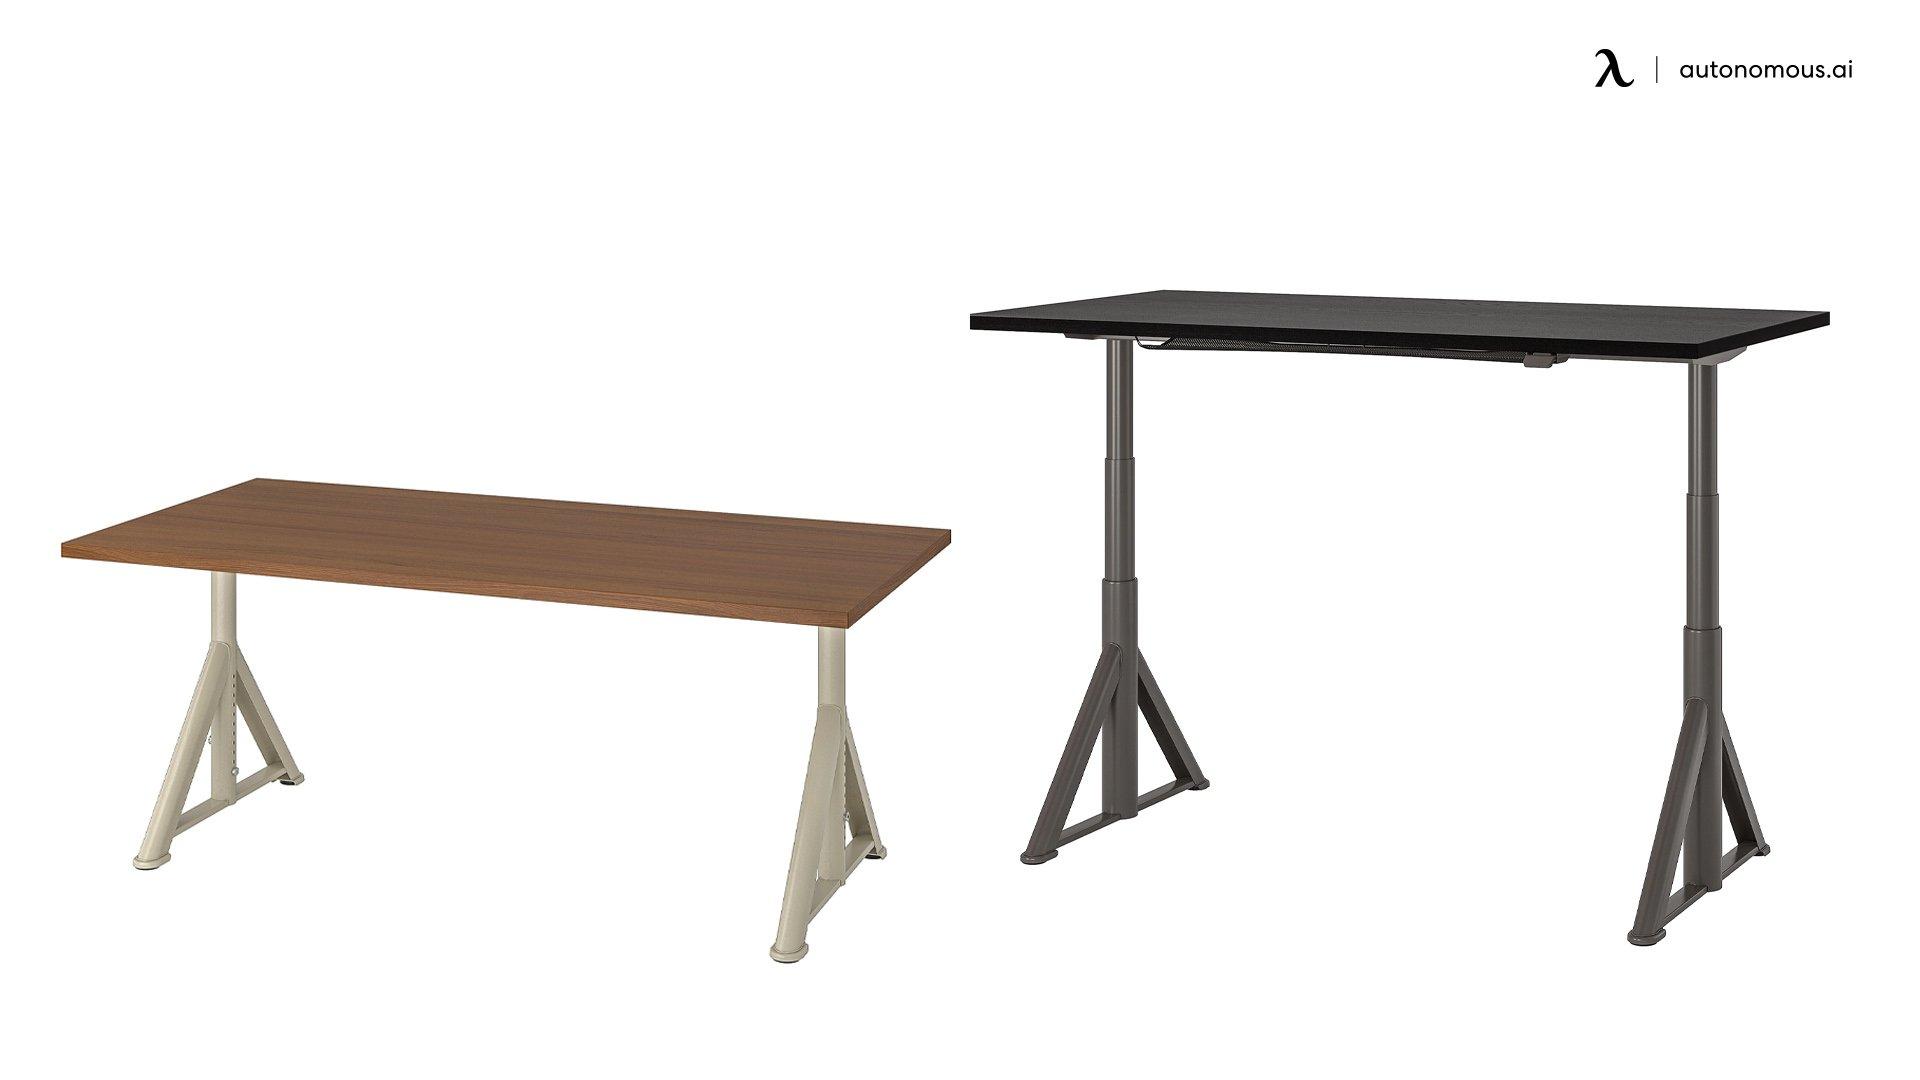 Ikea IDÅSEN Home Standing Desk